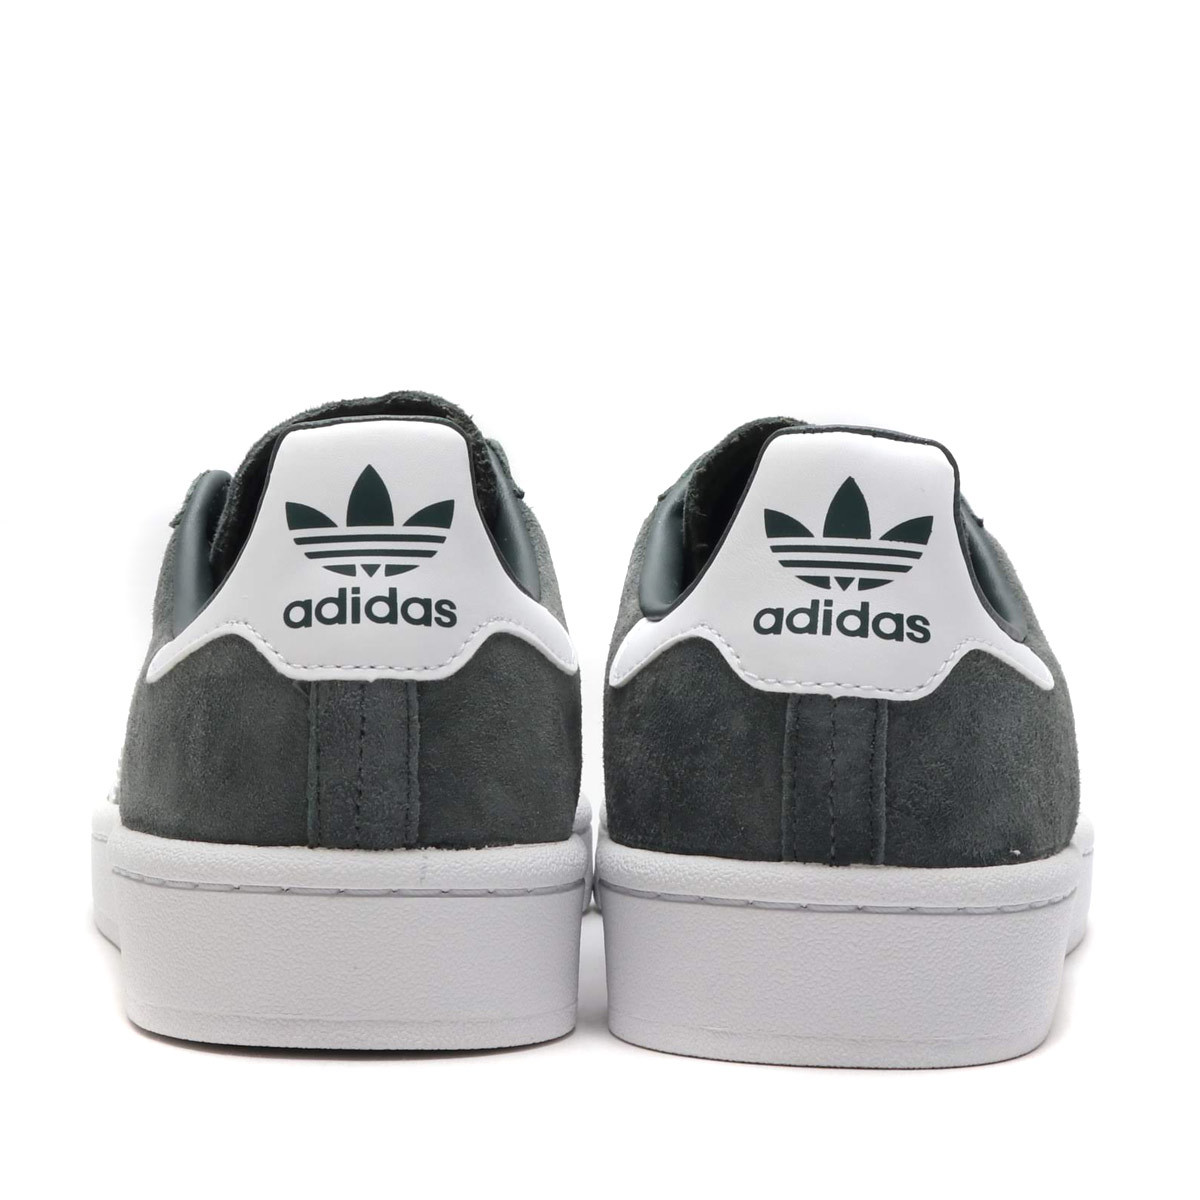 27.5cm●アディダス オリジナルス キャンパス オリーブ グレー LEGEND IVY adidas Originals CAMPUS 80s CM8445 cp スニーカー 定番_画像6